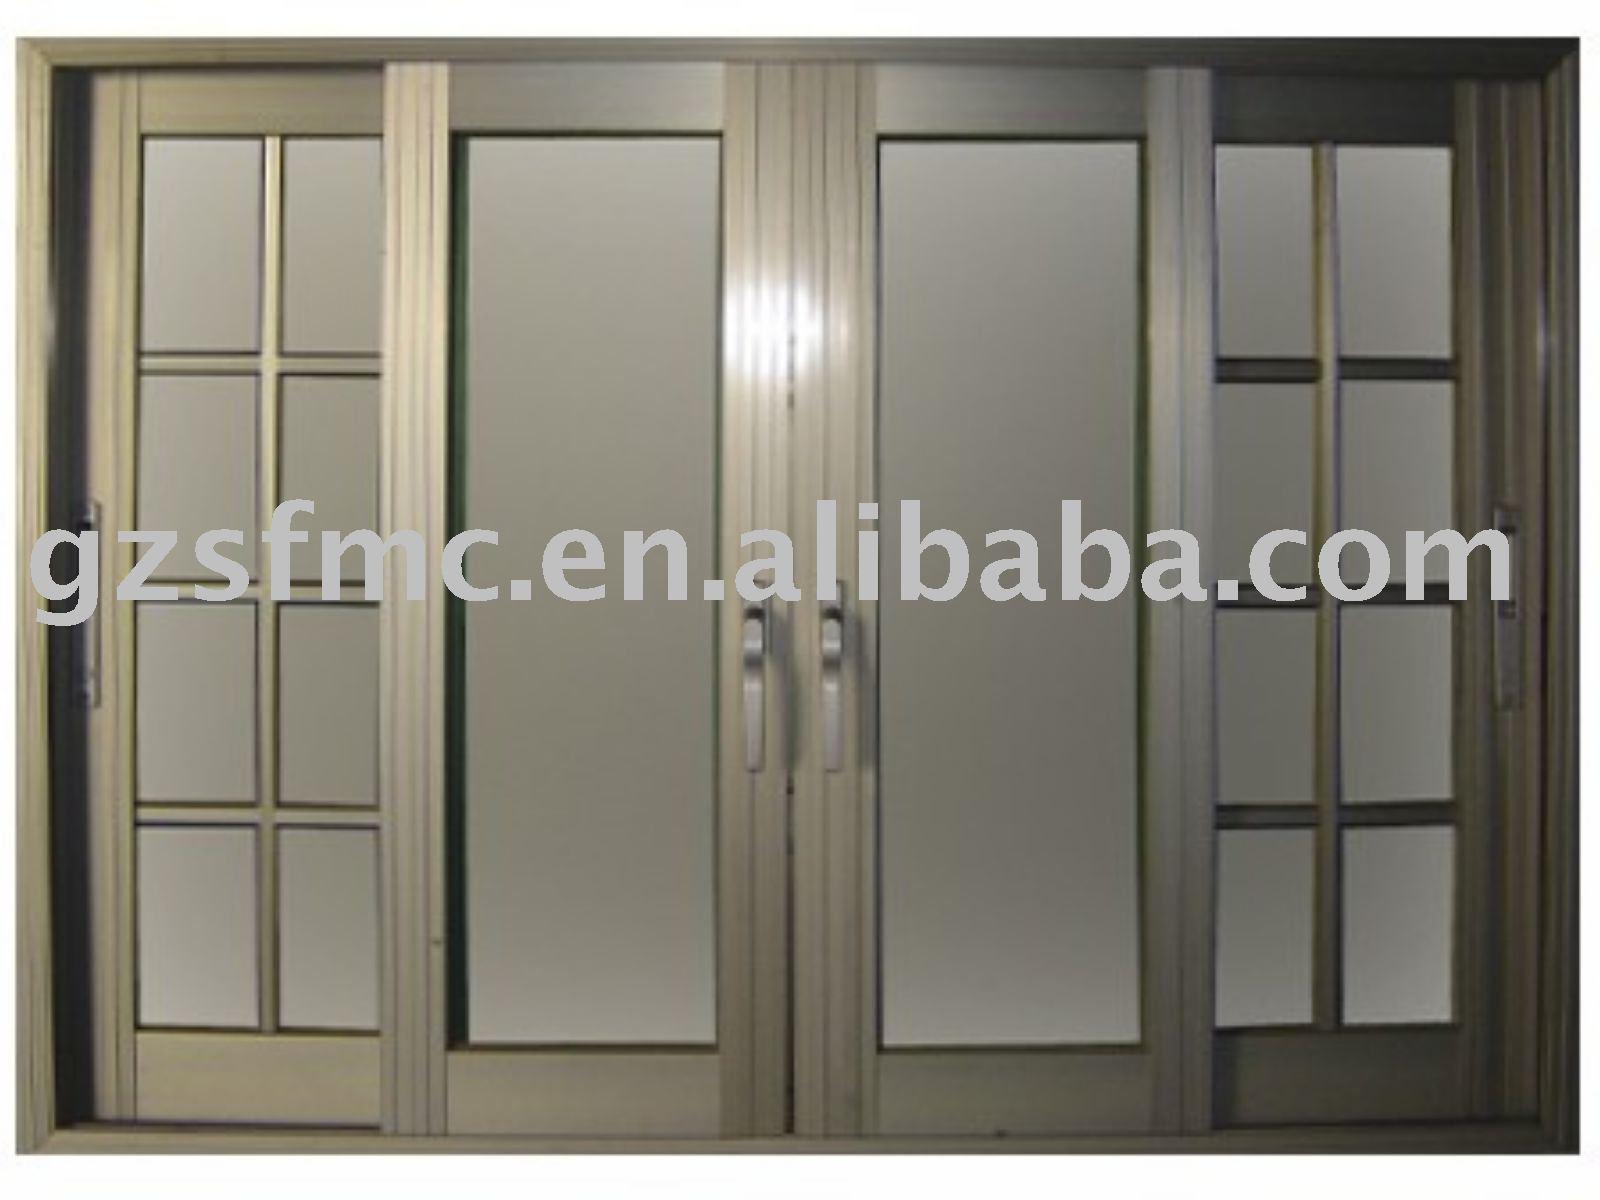 #776E54 Janela de alumínio Windows ID do produto:303956355 portuguese.alibaba  768 Kit Janela De Aluminio